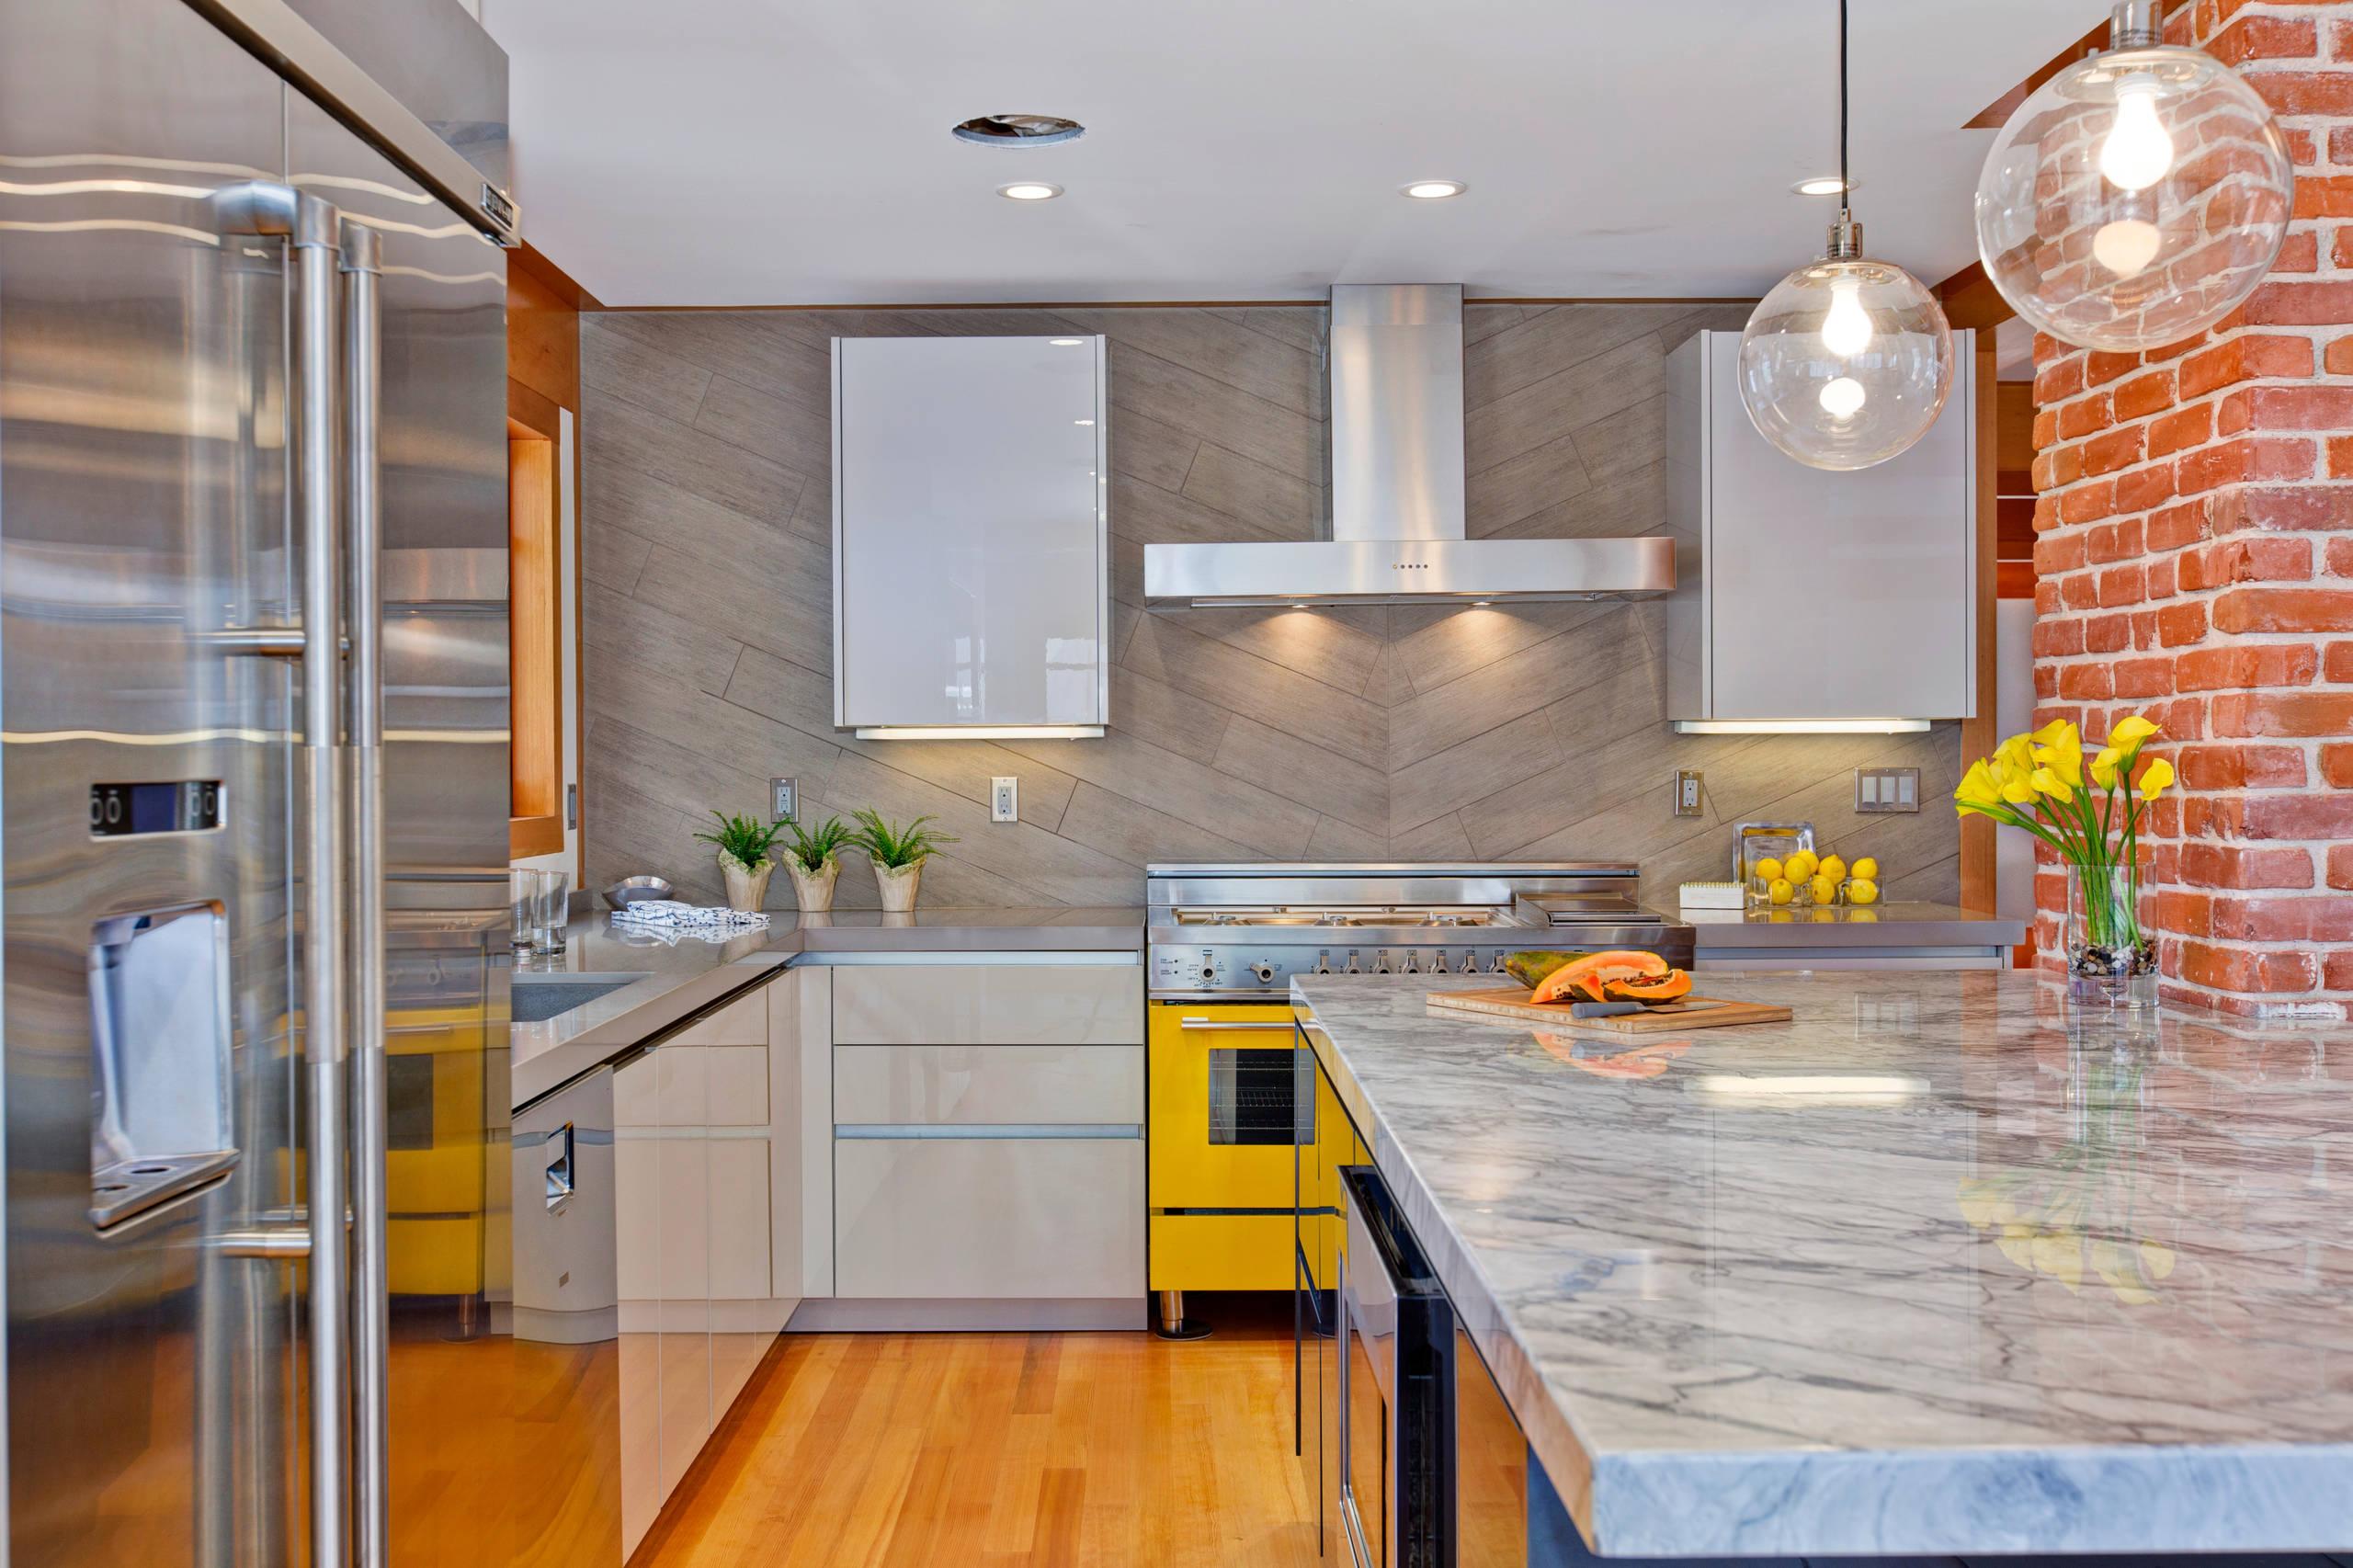 2016 Kitchen Ideas Photos Houzz